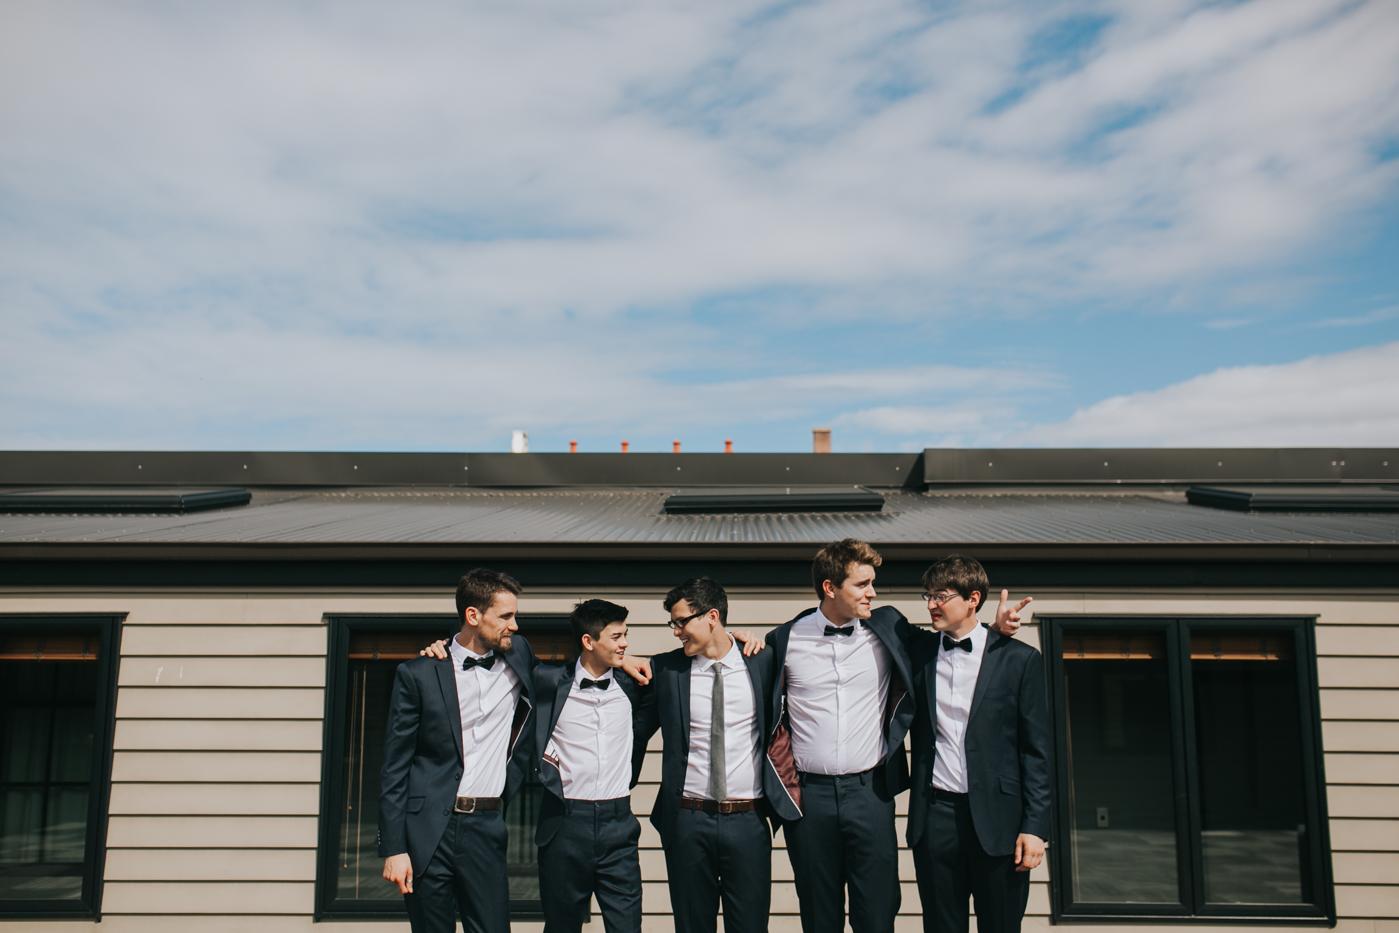 Ariana & Tim - Dunedin, New Zealand Wedding - Destination Wedding - Samantha Heather Photography-24.jpg